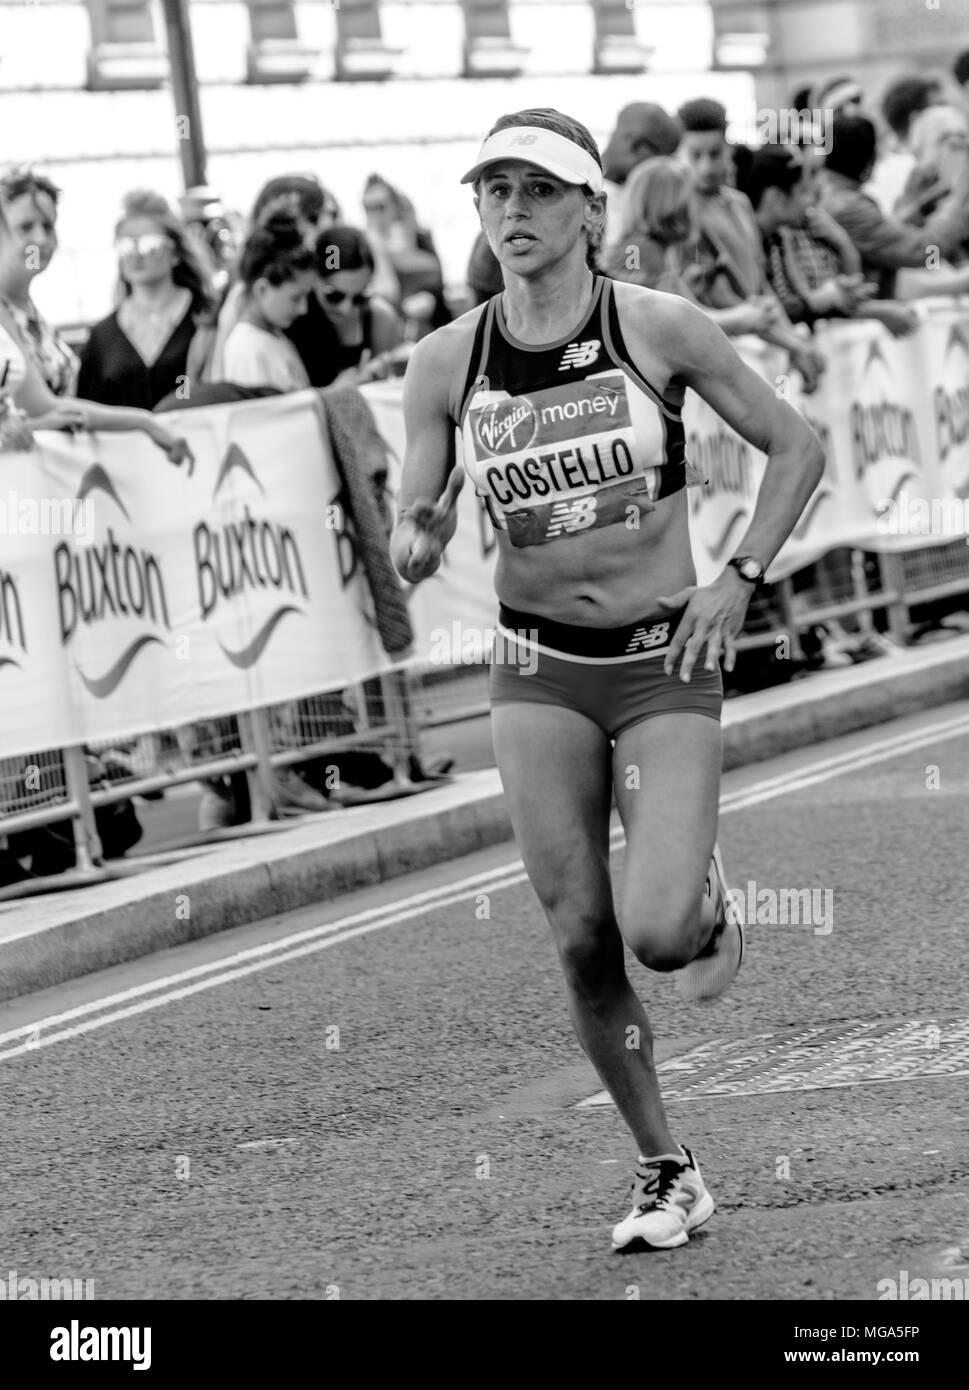 Virgin Marathon Runners, London 2018 - Stock Image